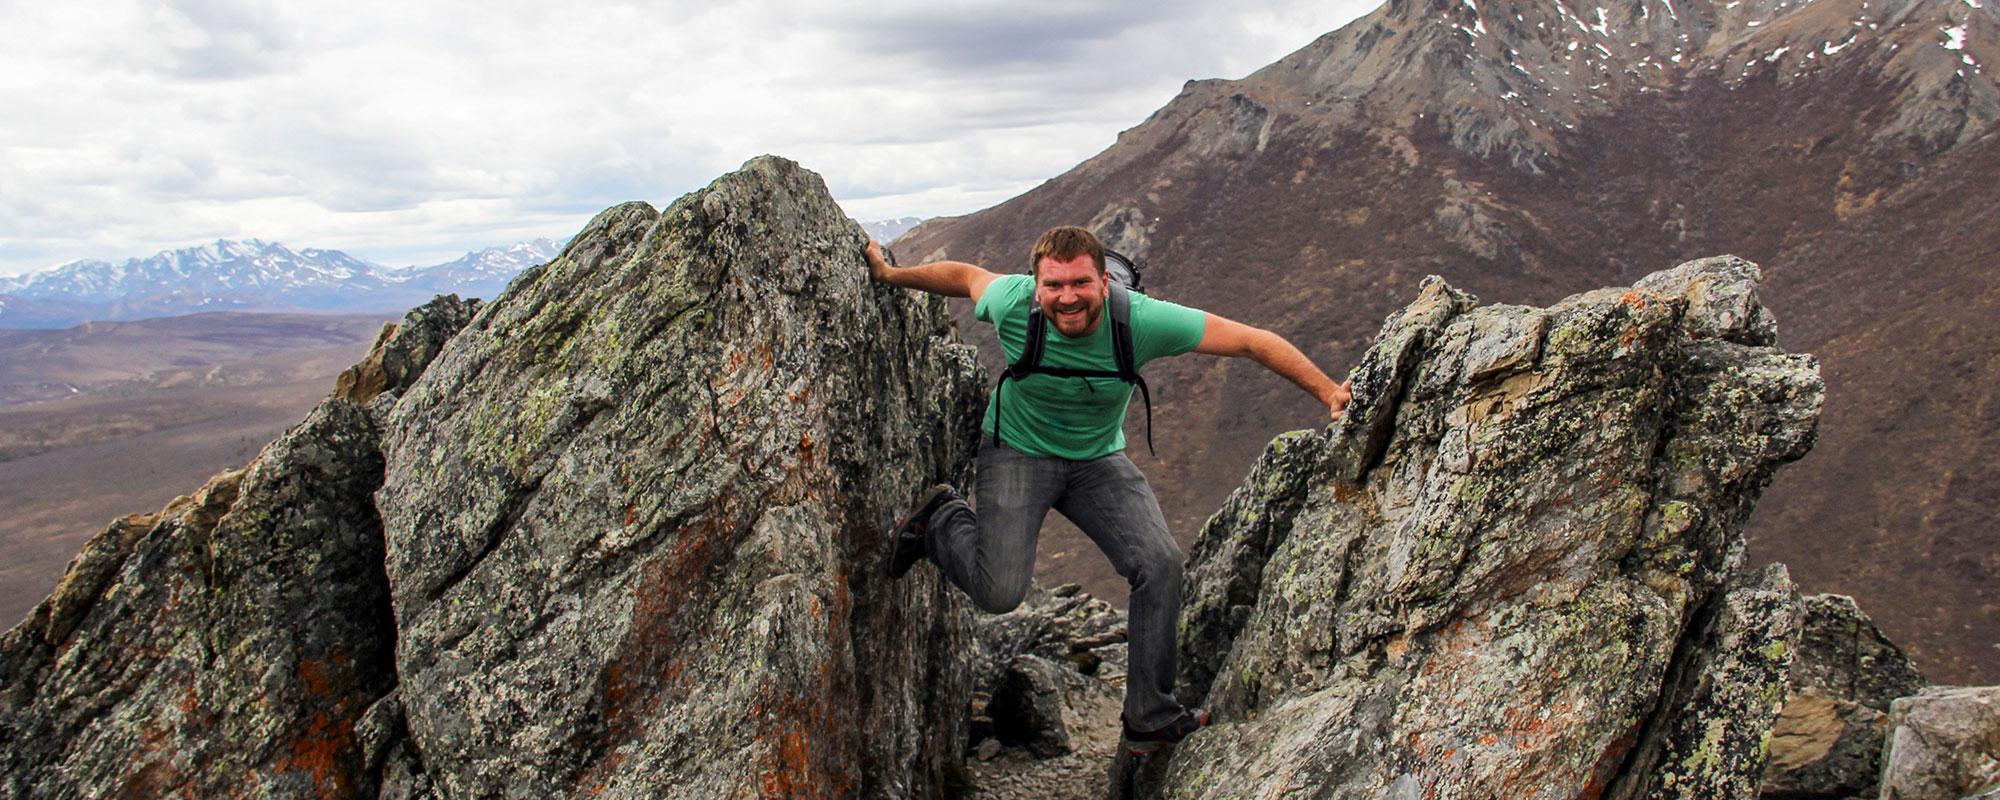 Pete at Denali National Park, Alaska